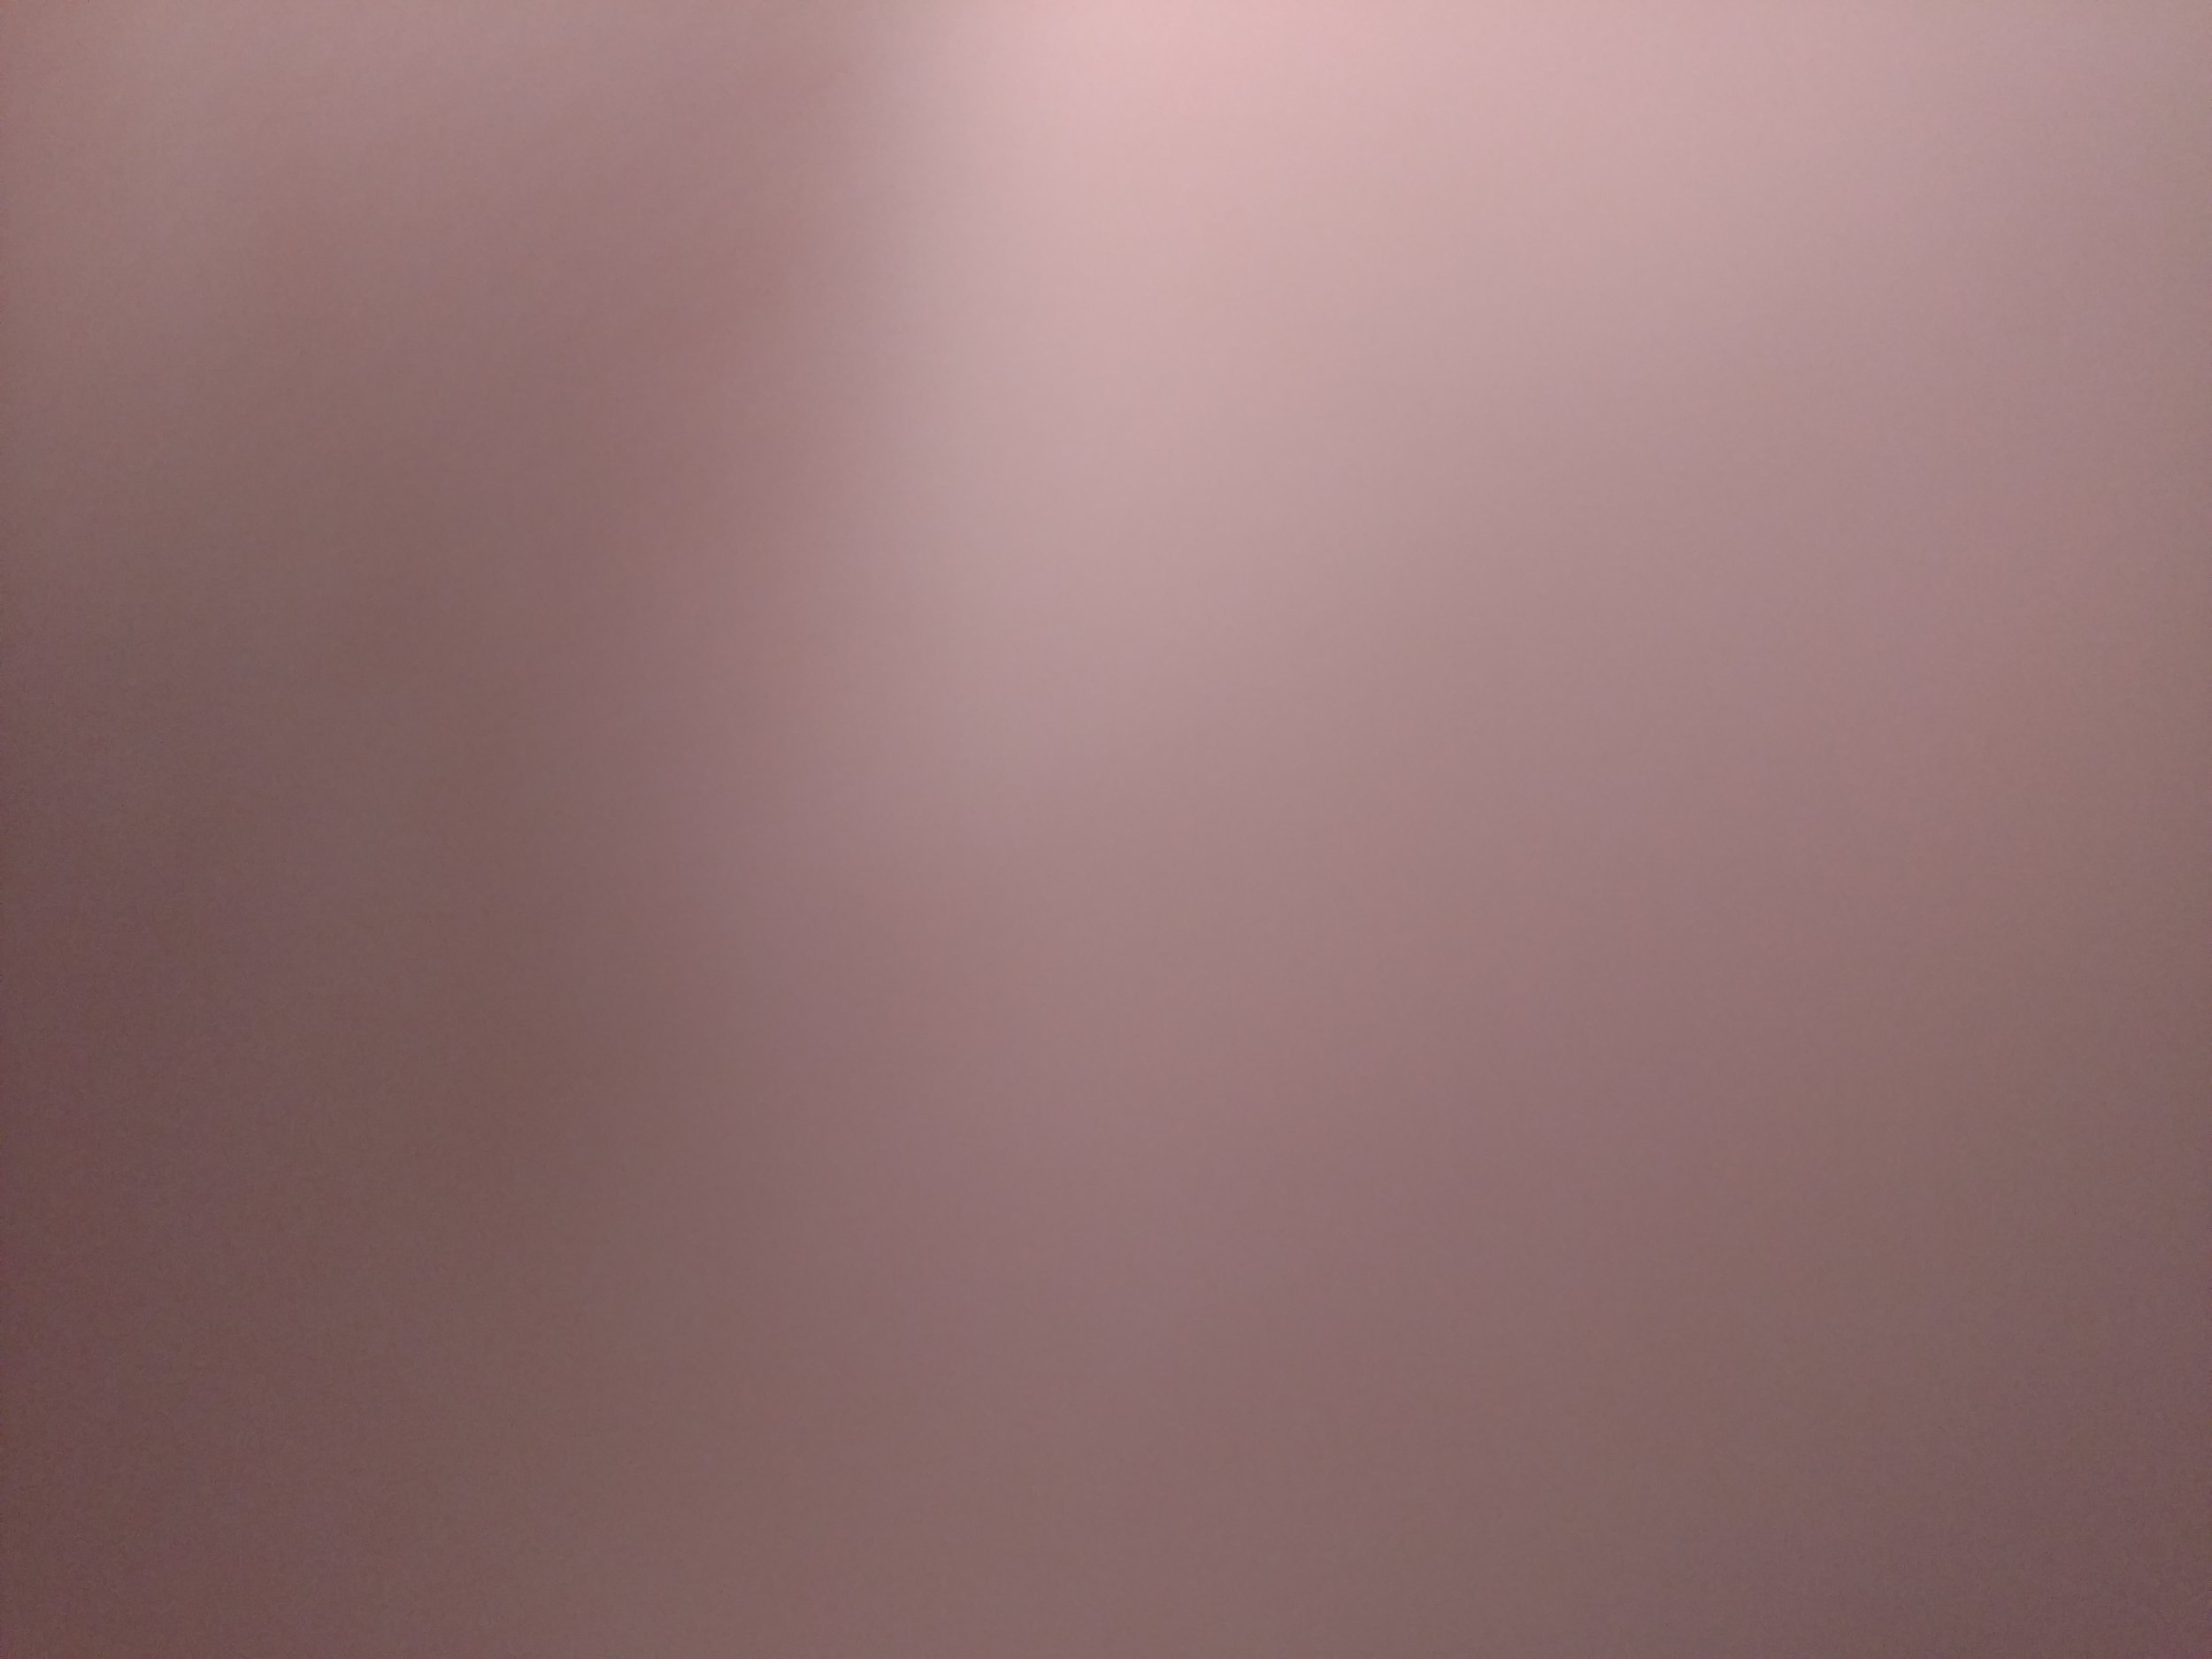 willroth-co-free-texture-gradient-019.jpg